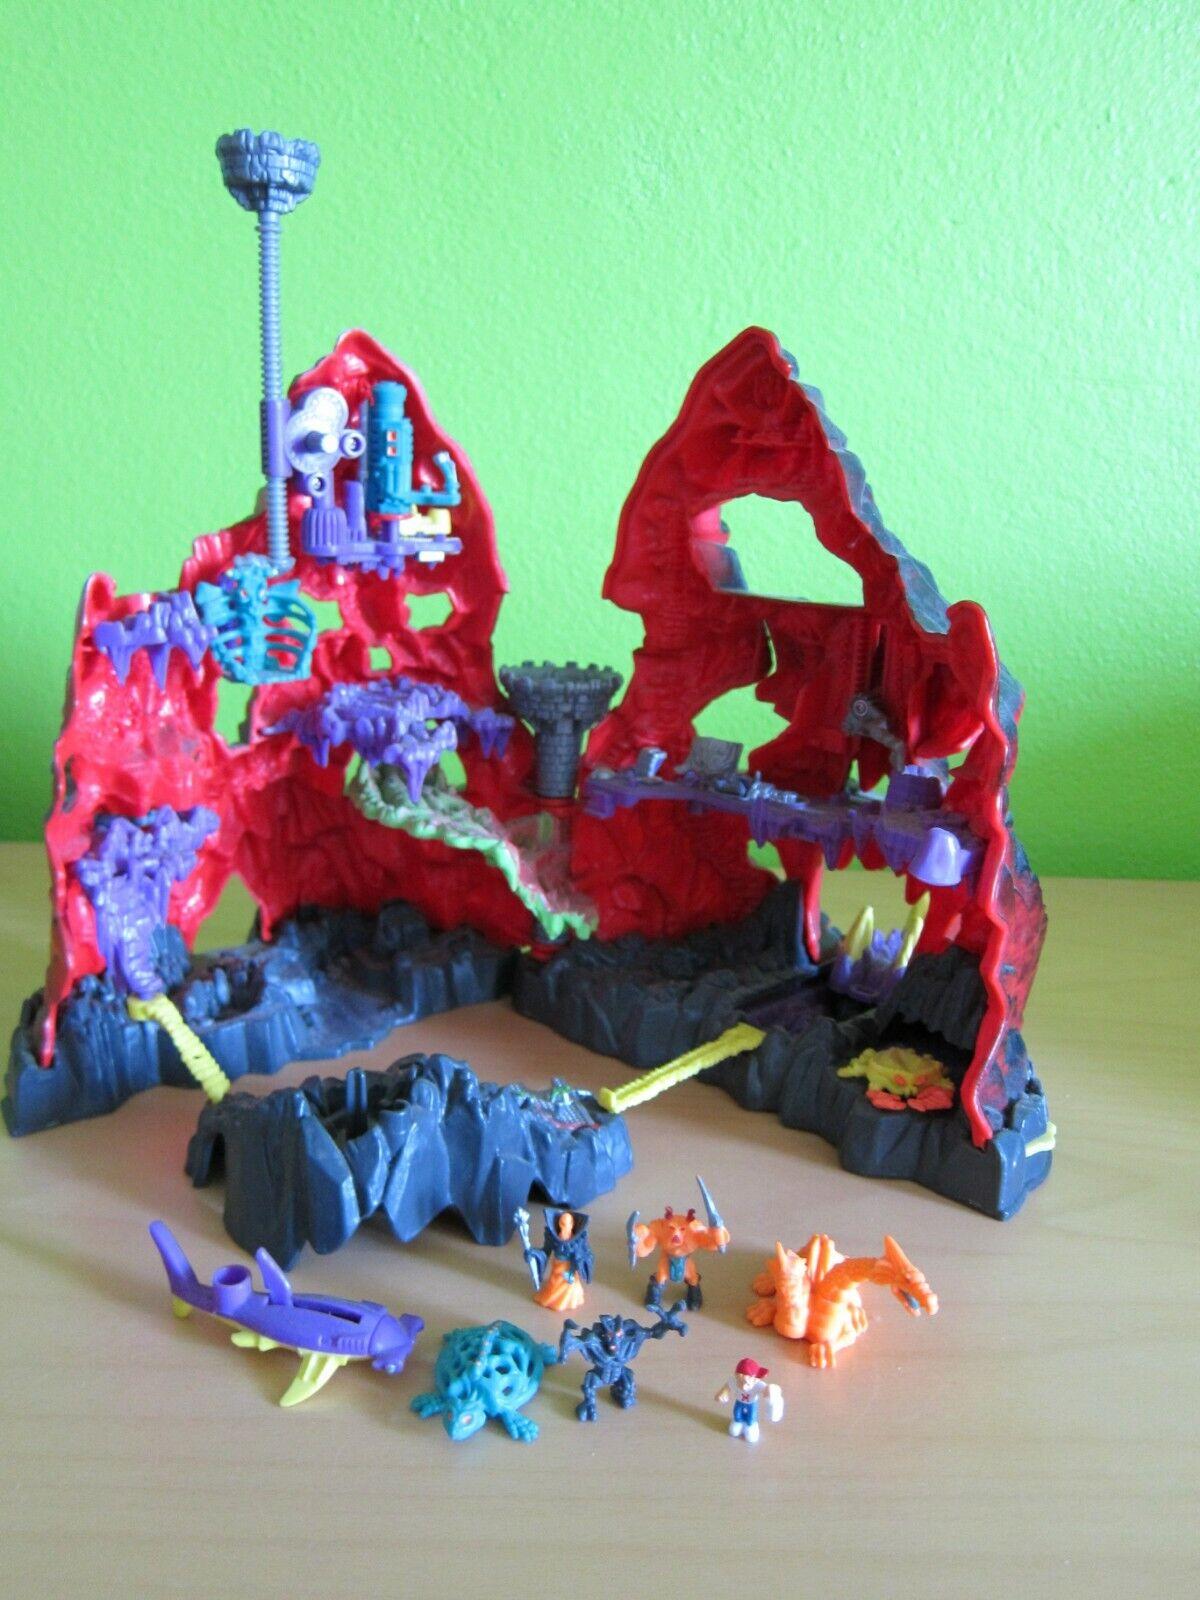 Mighty Max big ones Skull Mountain juego lata mini basurillas etc. Polly Pocket